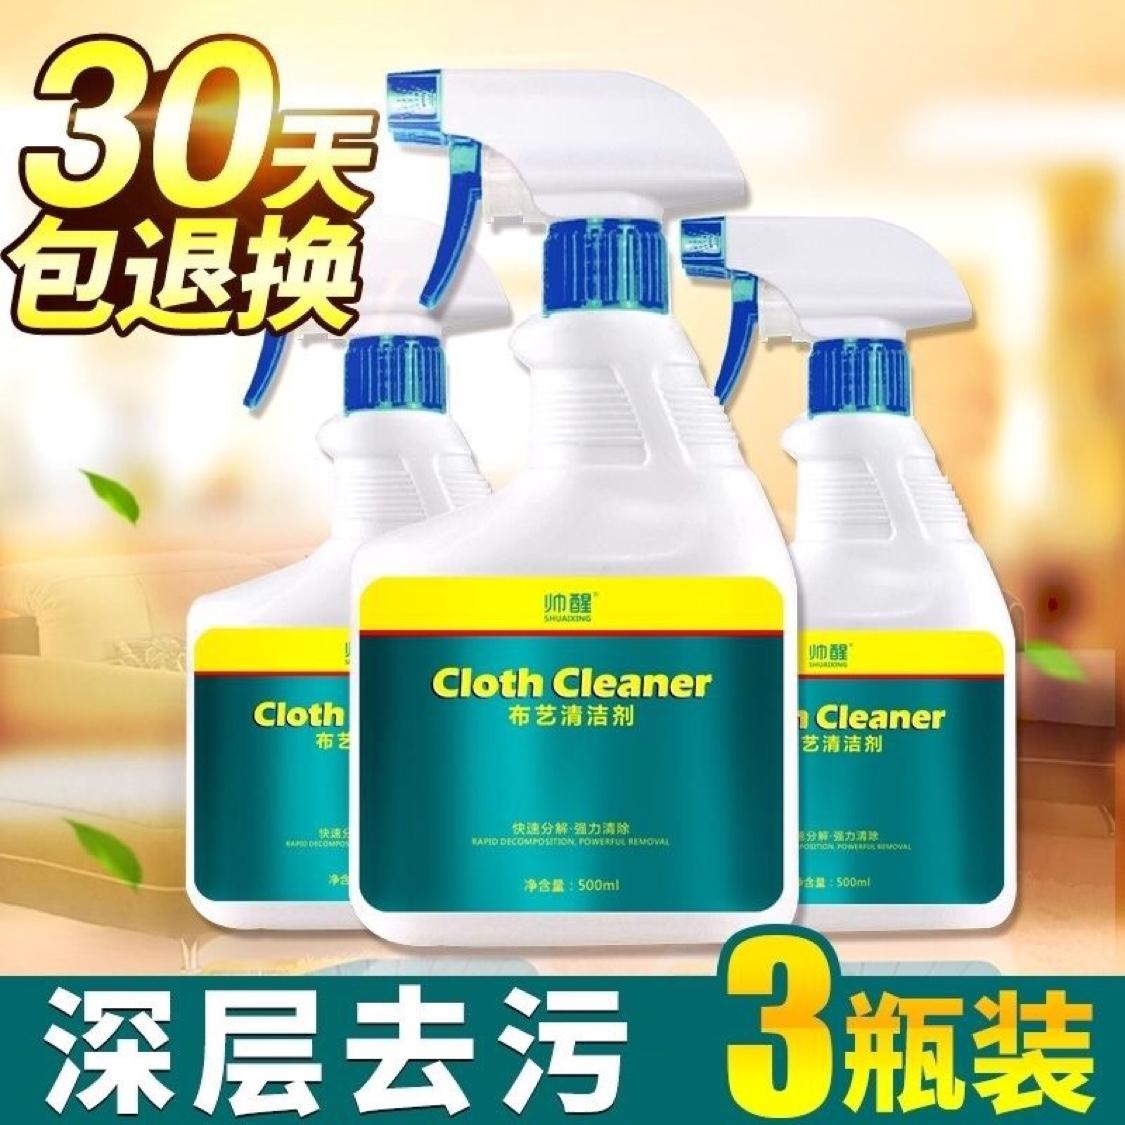 Средства для очистки мебели Артикул 599871534684